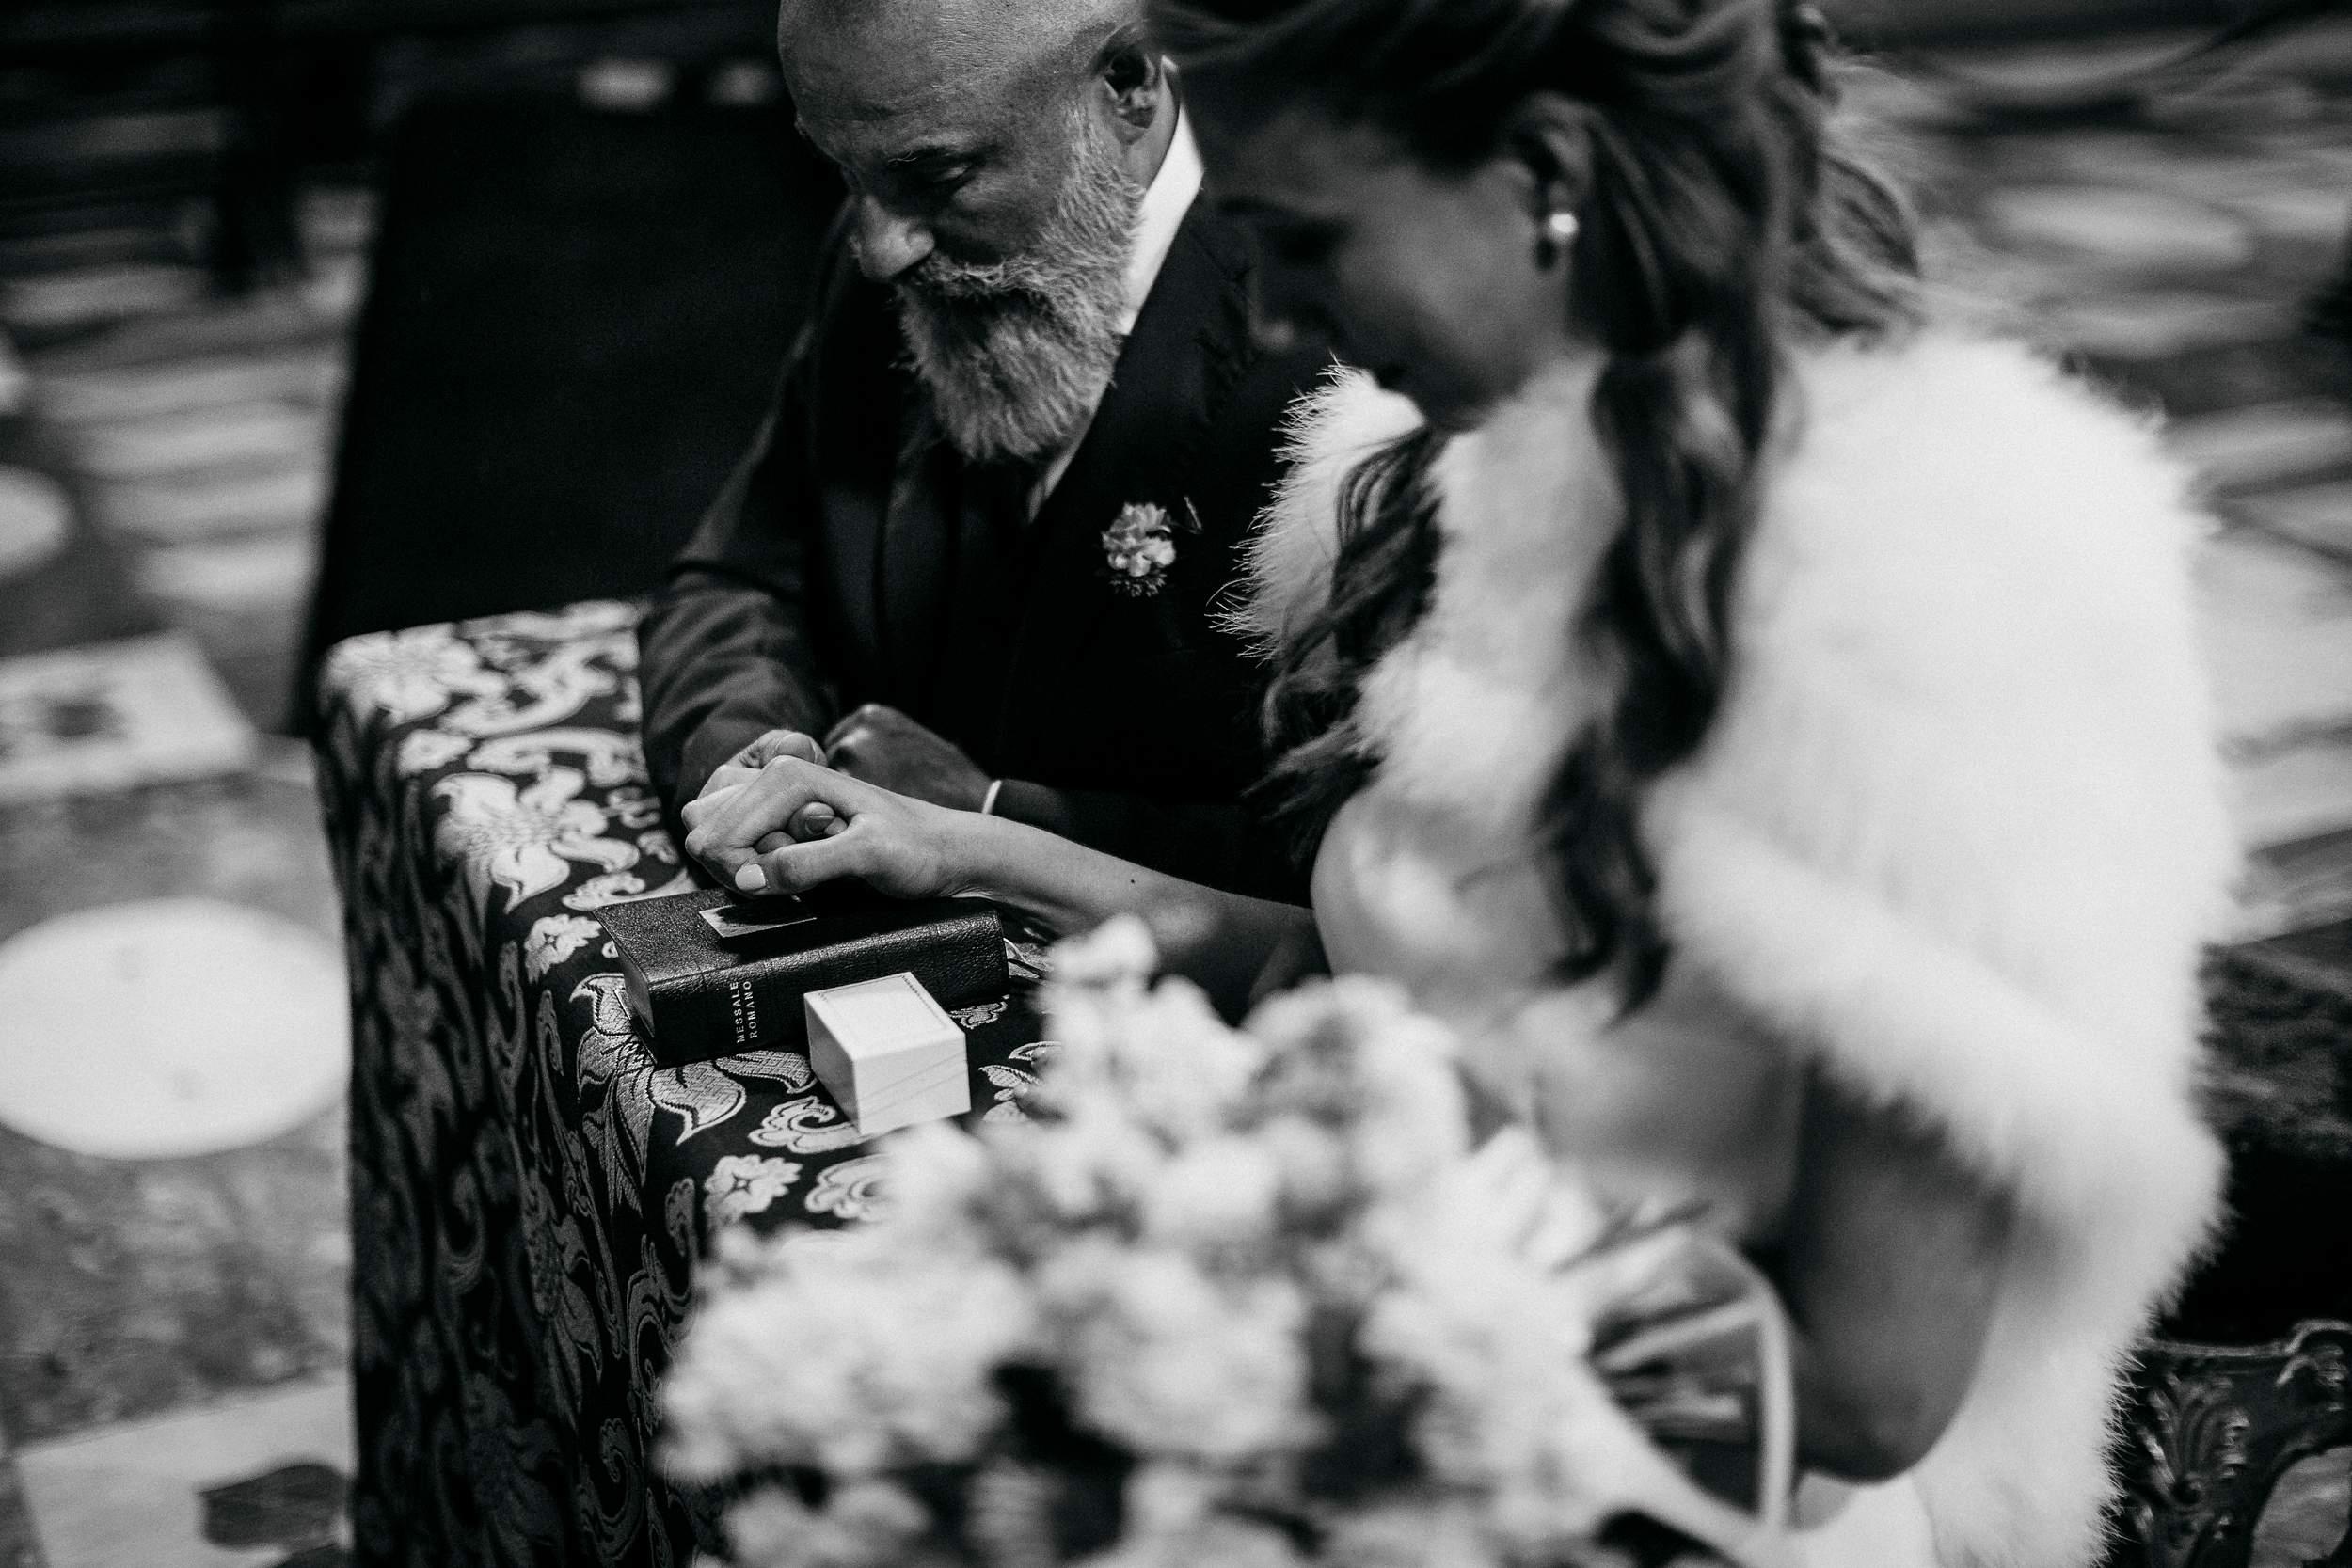 wedding in Florence church san Michele, matrimonio a Firenze, rito anticowedding in florence church san michele, matrimonio a firenze, rito antico